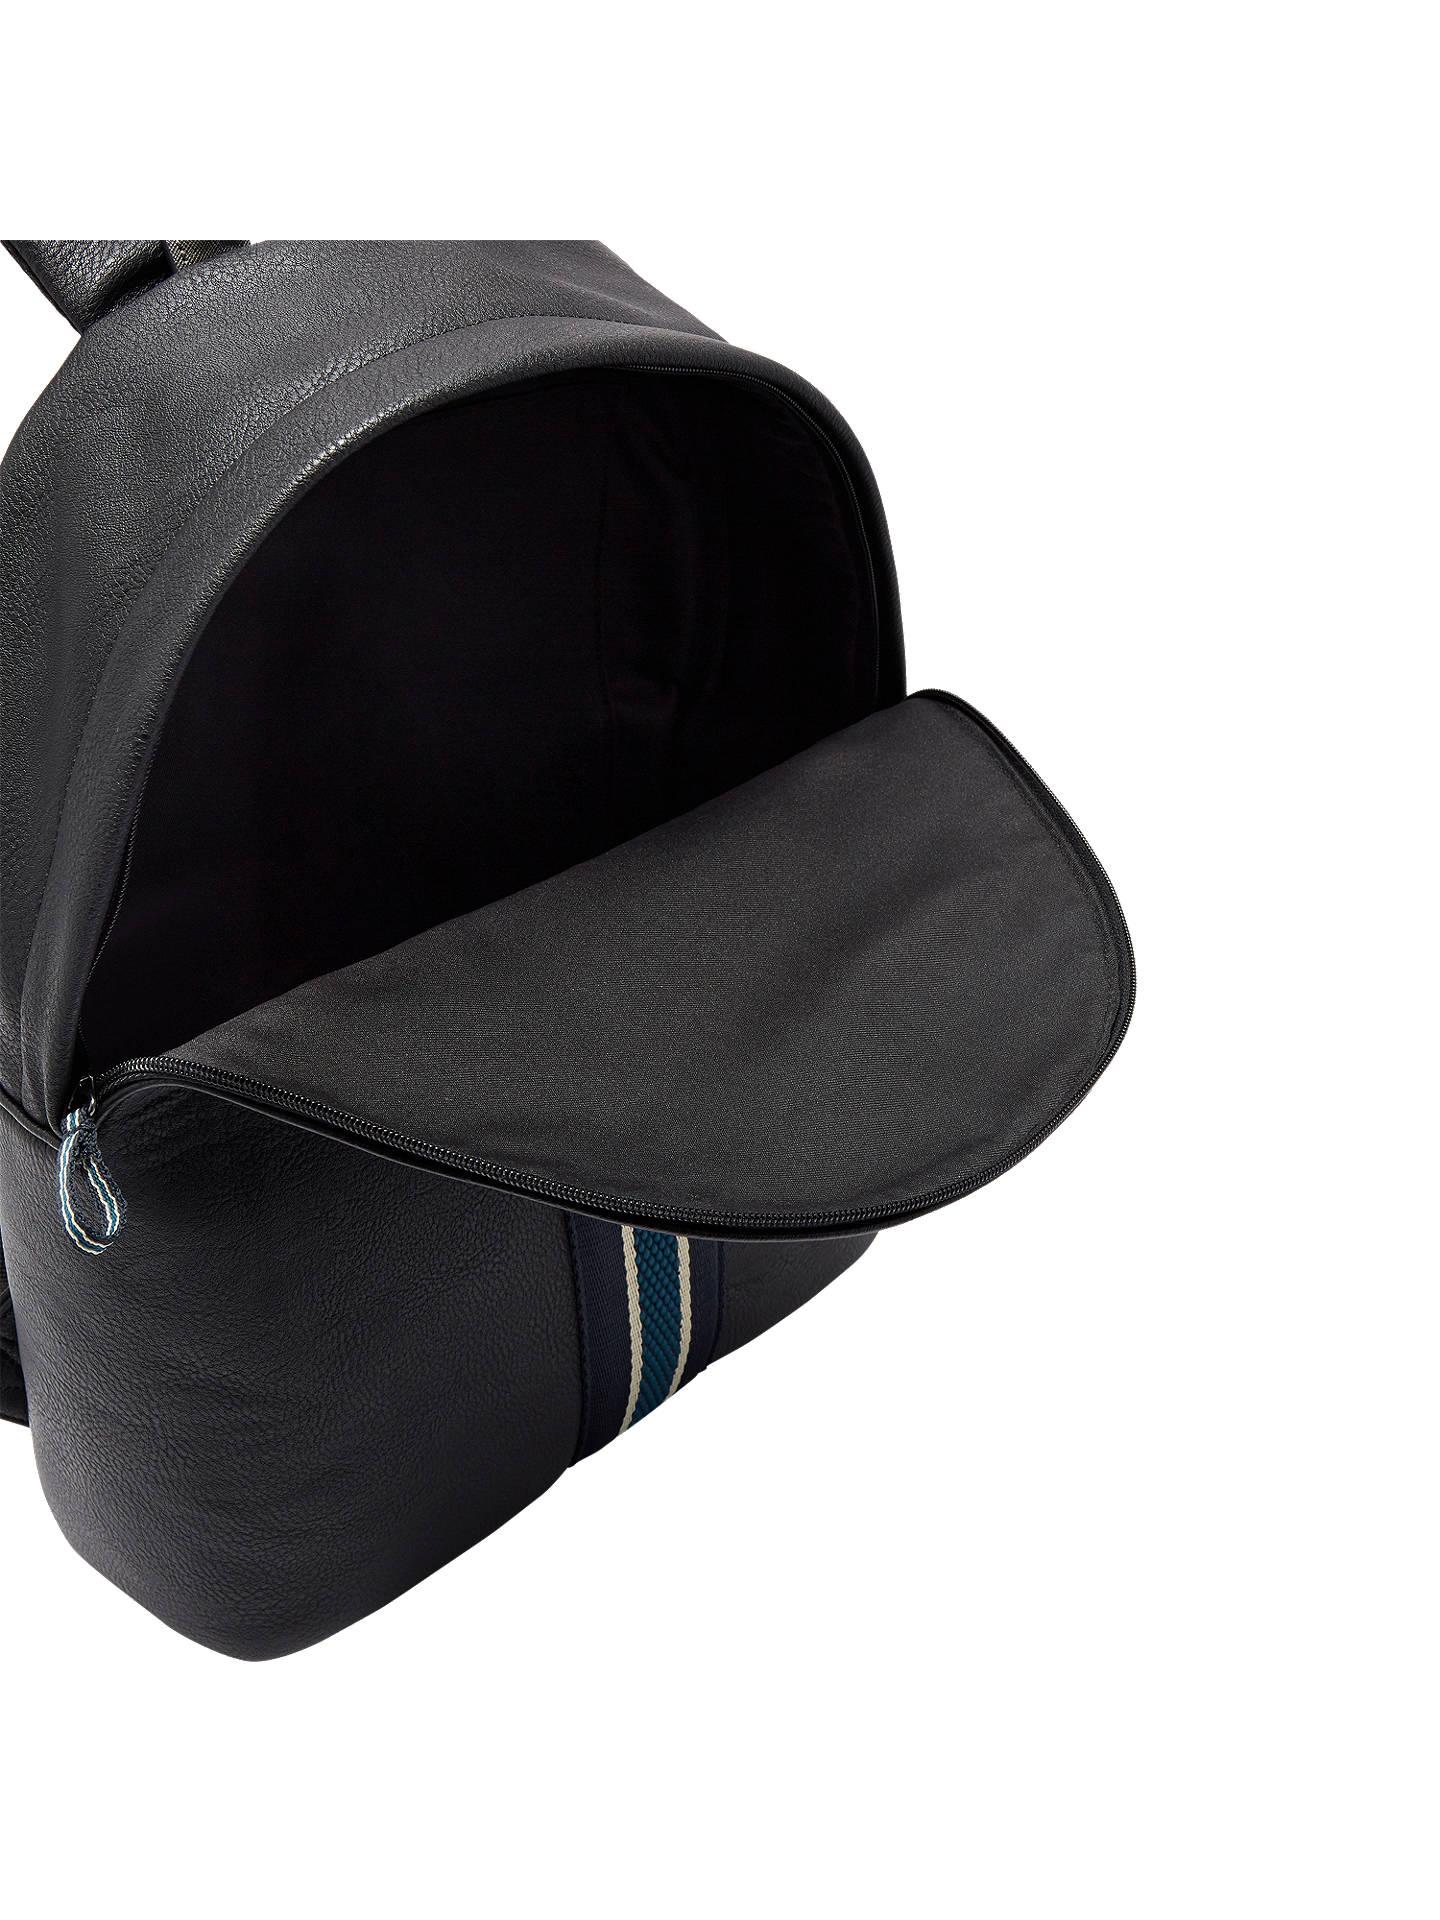 0c180c714c ... Buy Ted Baker Heriot Backpack